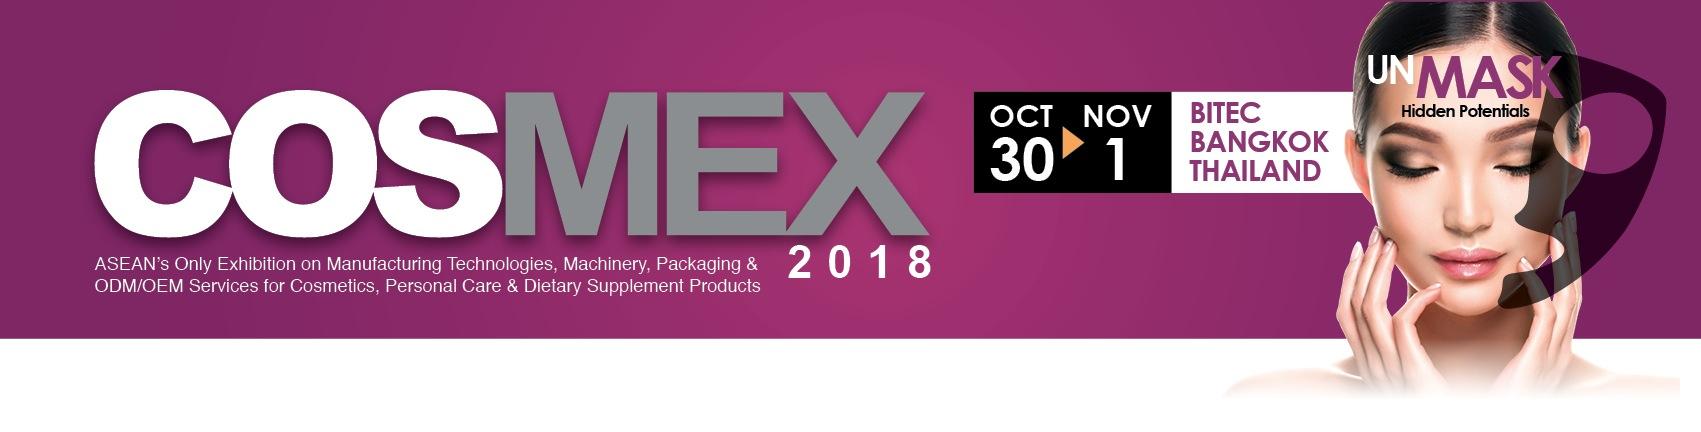 COSMEX 2018